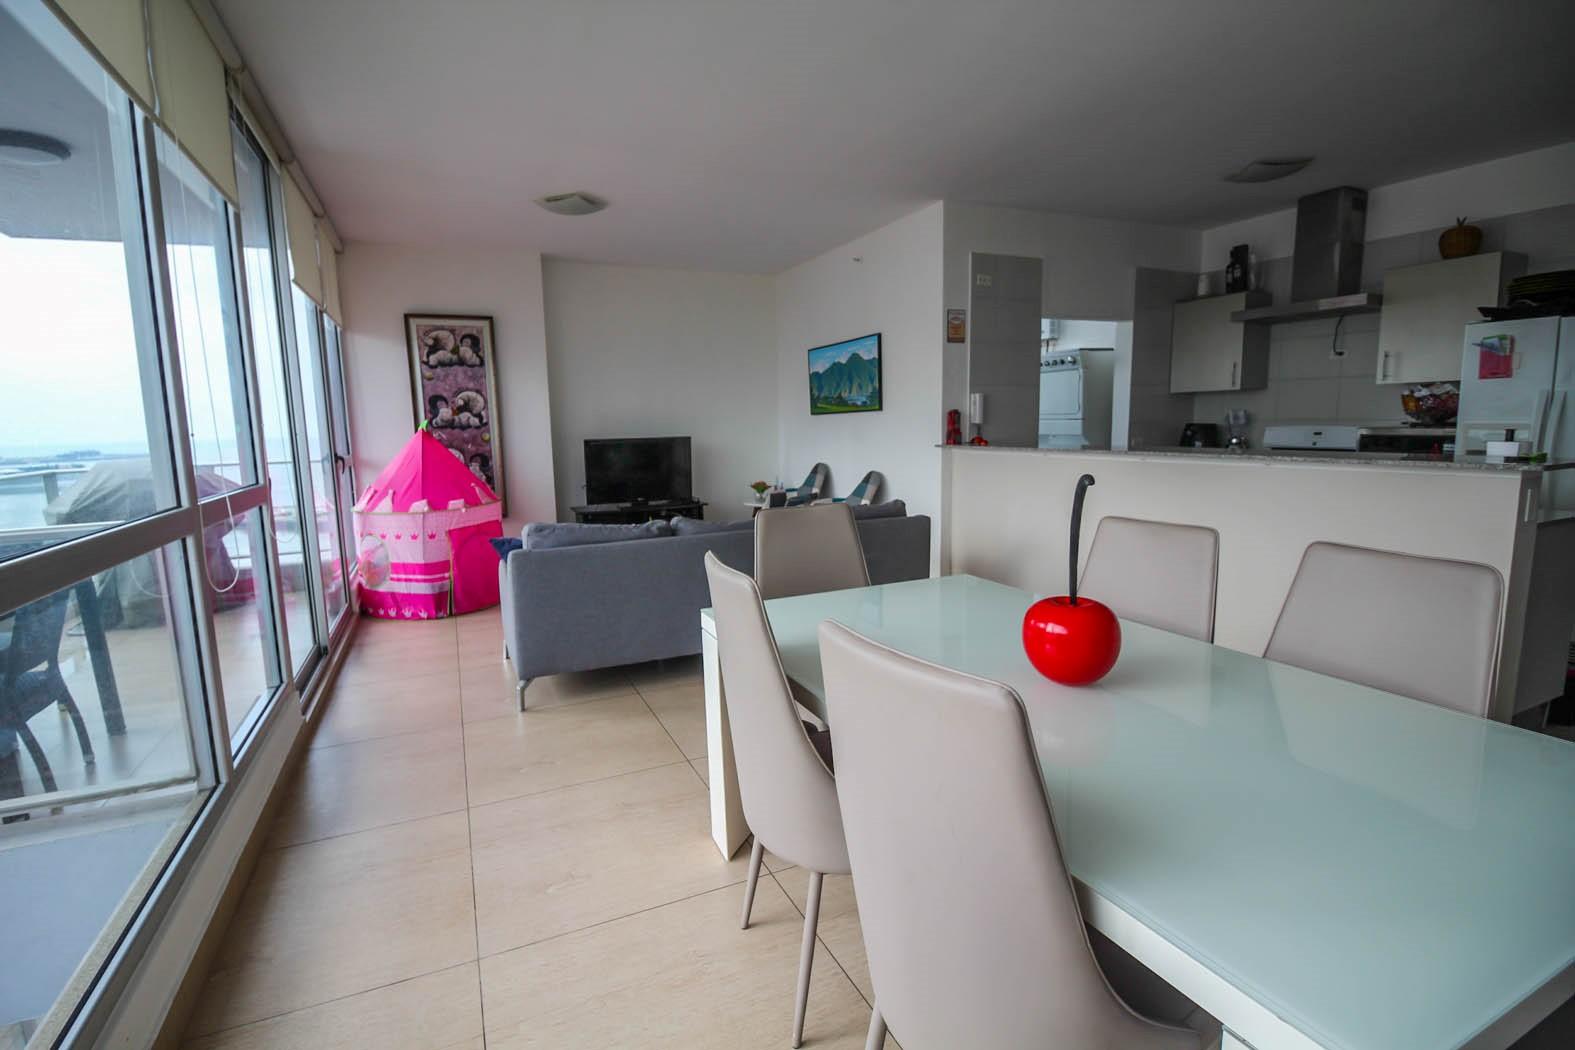 Avenida-Balboa-Panama-property-panamaequityocean-city-views-2nd-line-balboa-ave.jpg